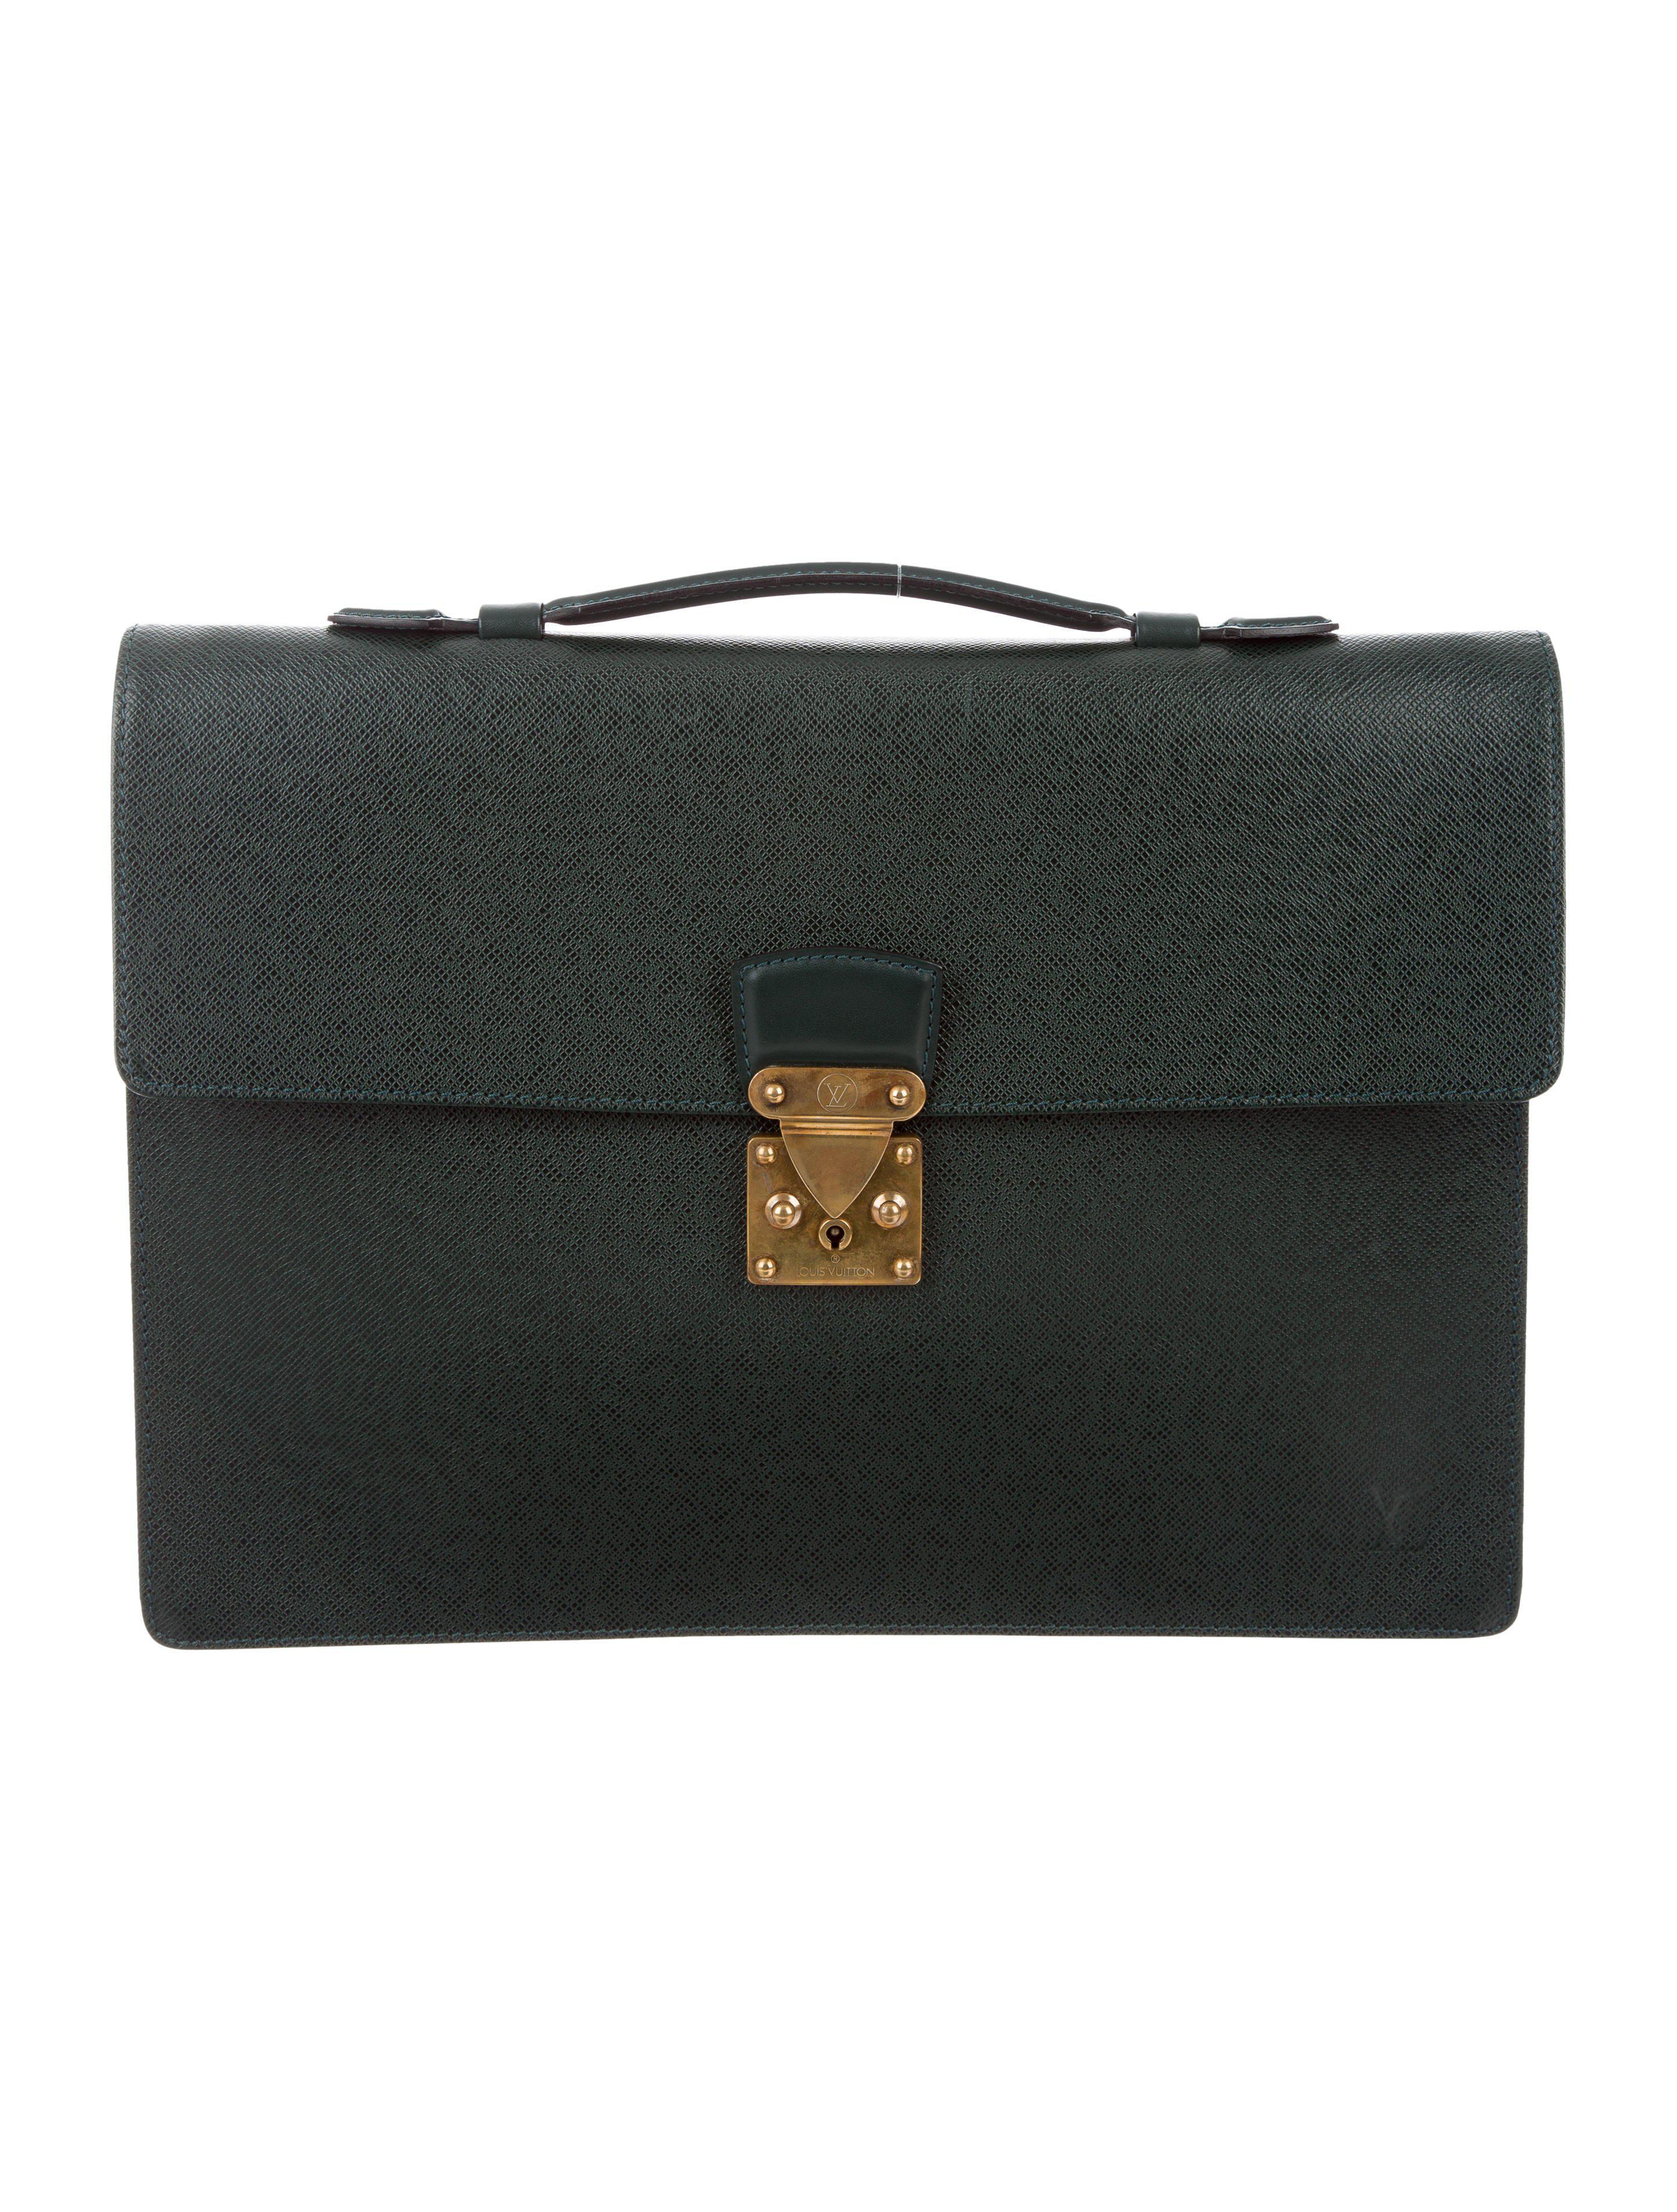 7d249dd727a5 Lyst - Louis Vuitton Taiga Serviette Kourad Briefcase in Green for Men